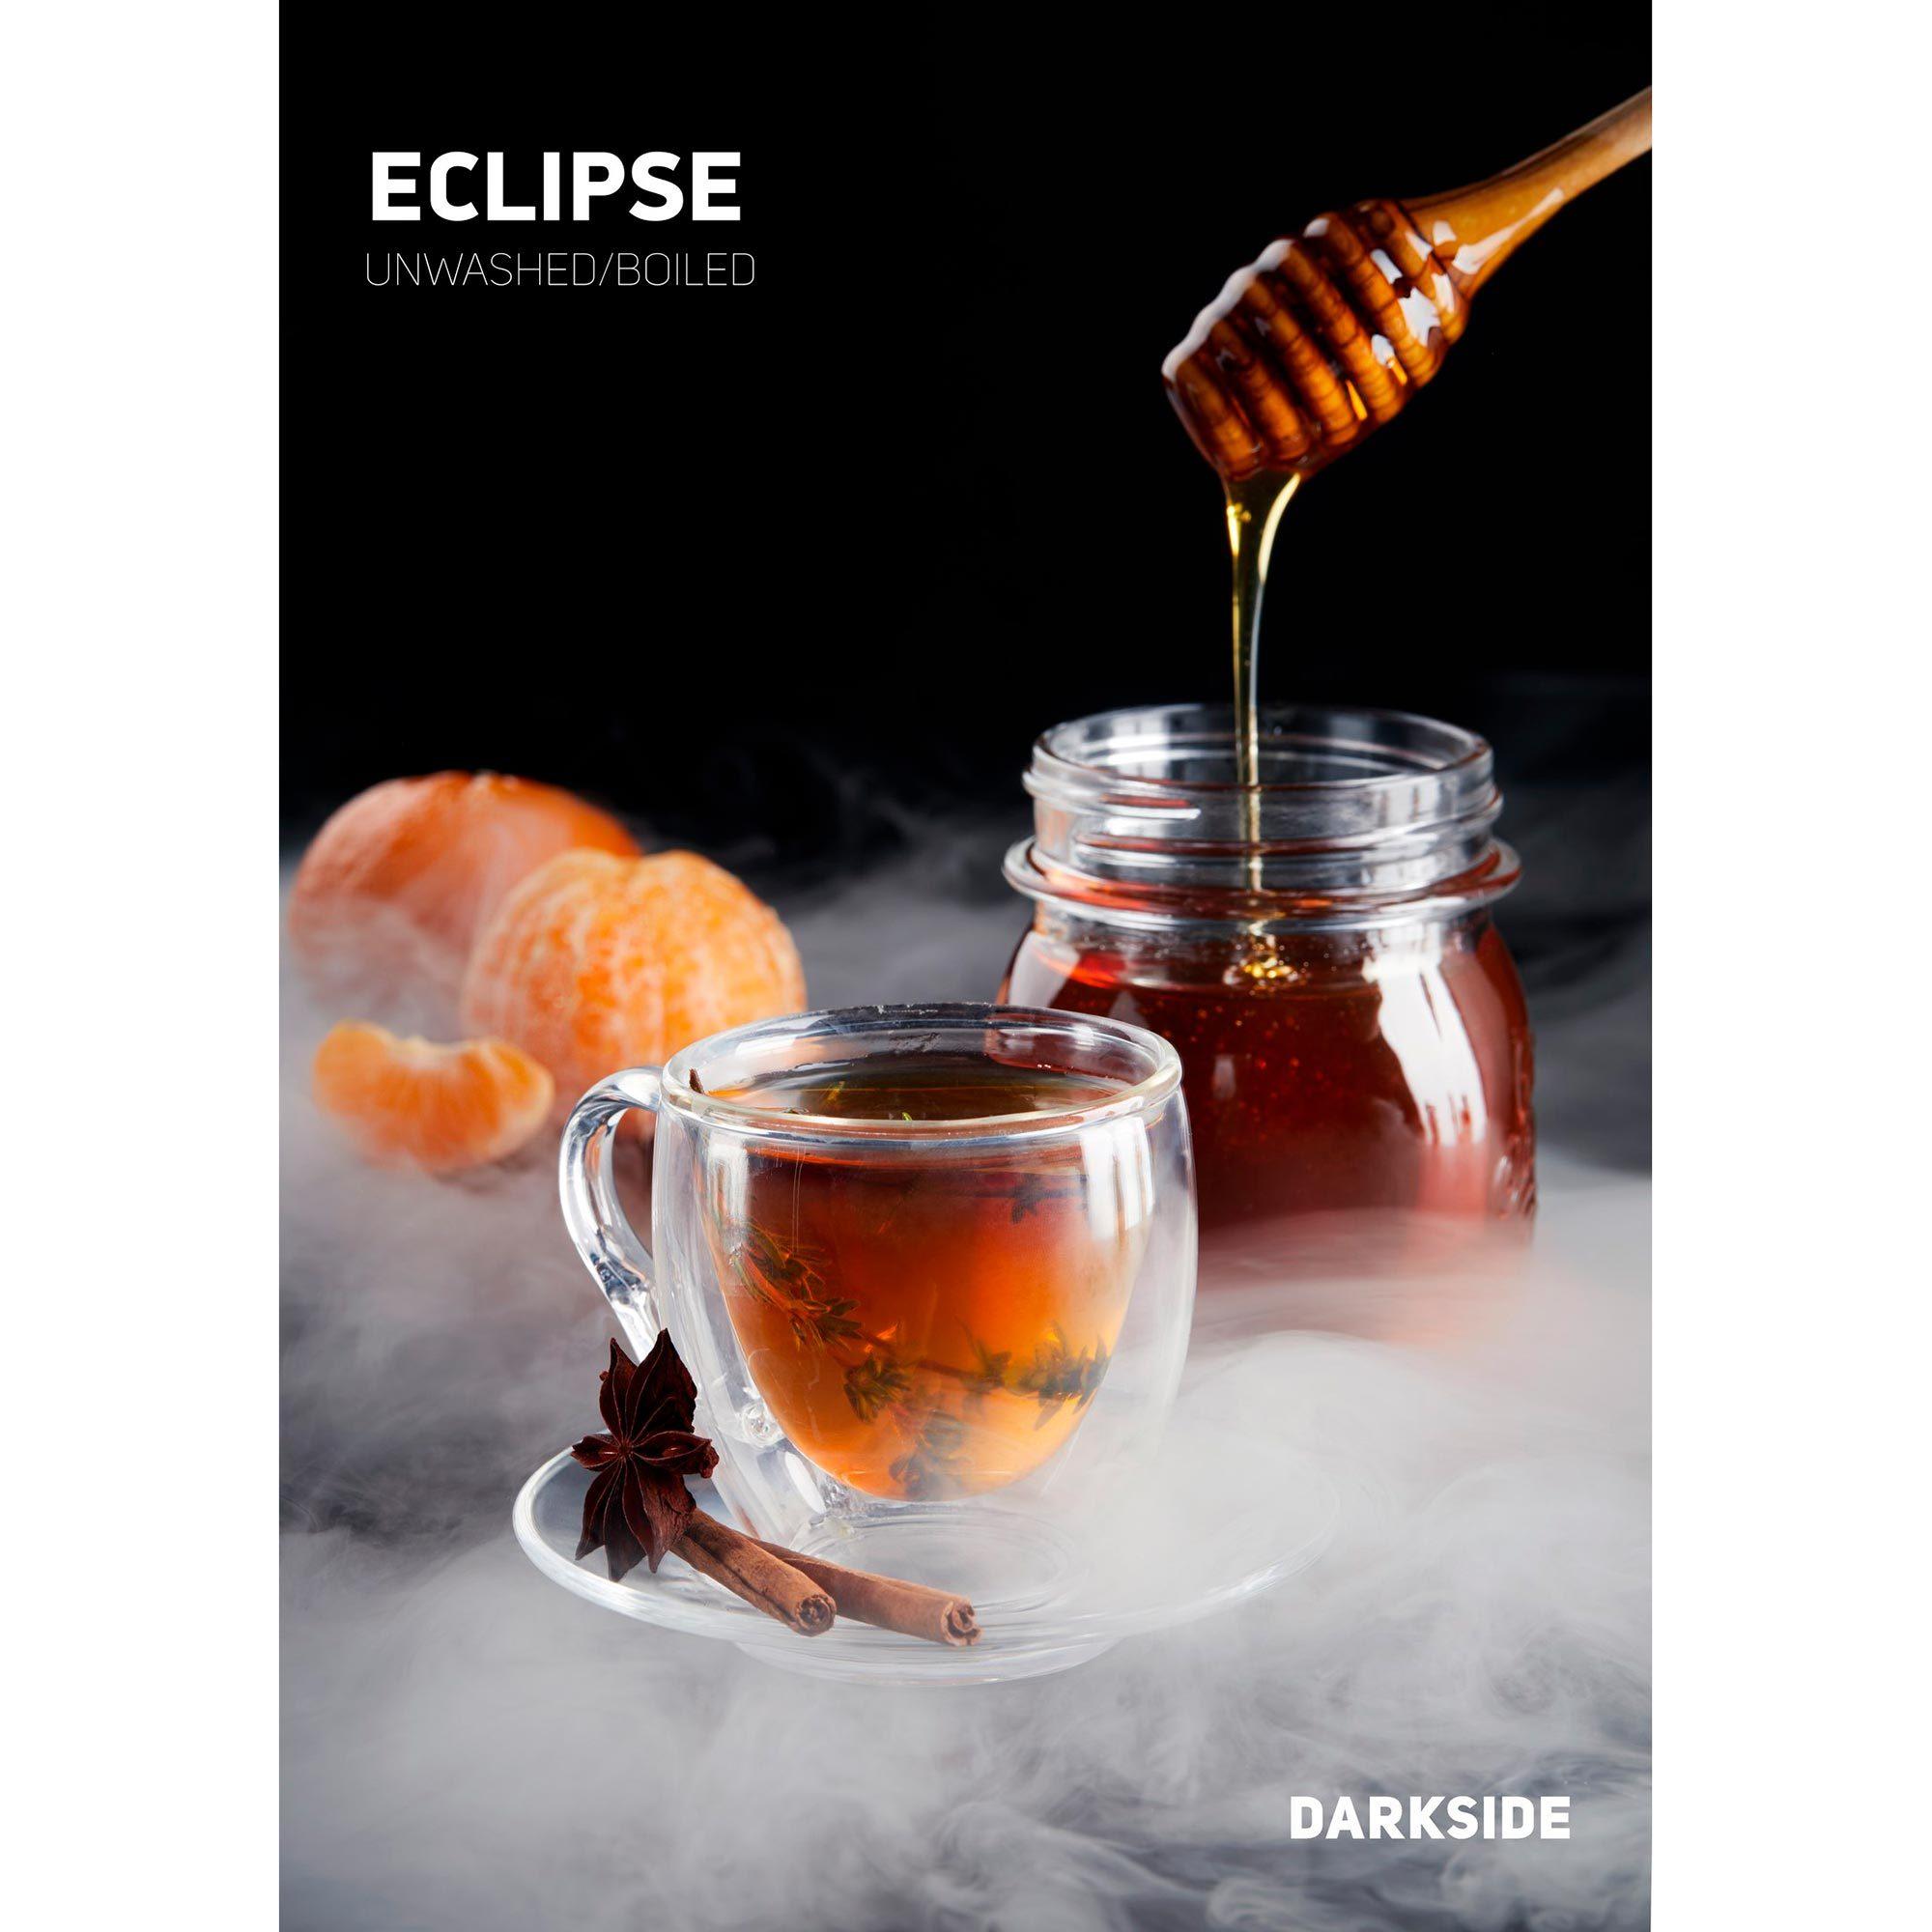 Табак для кальяна Dark Side Core 100 гр Eclipse, магазин FOHM